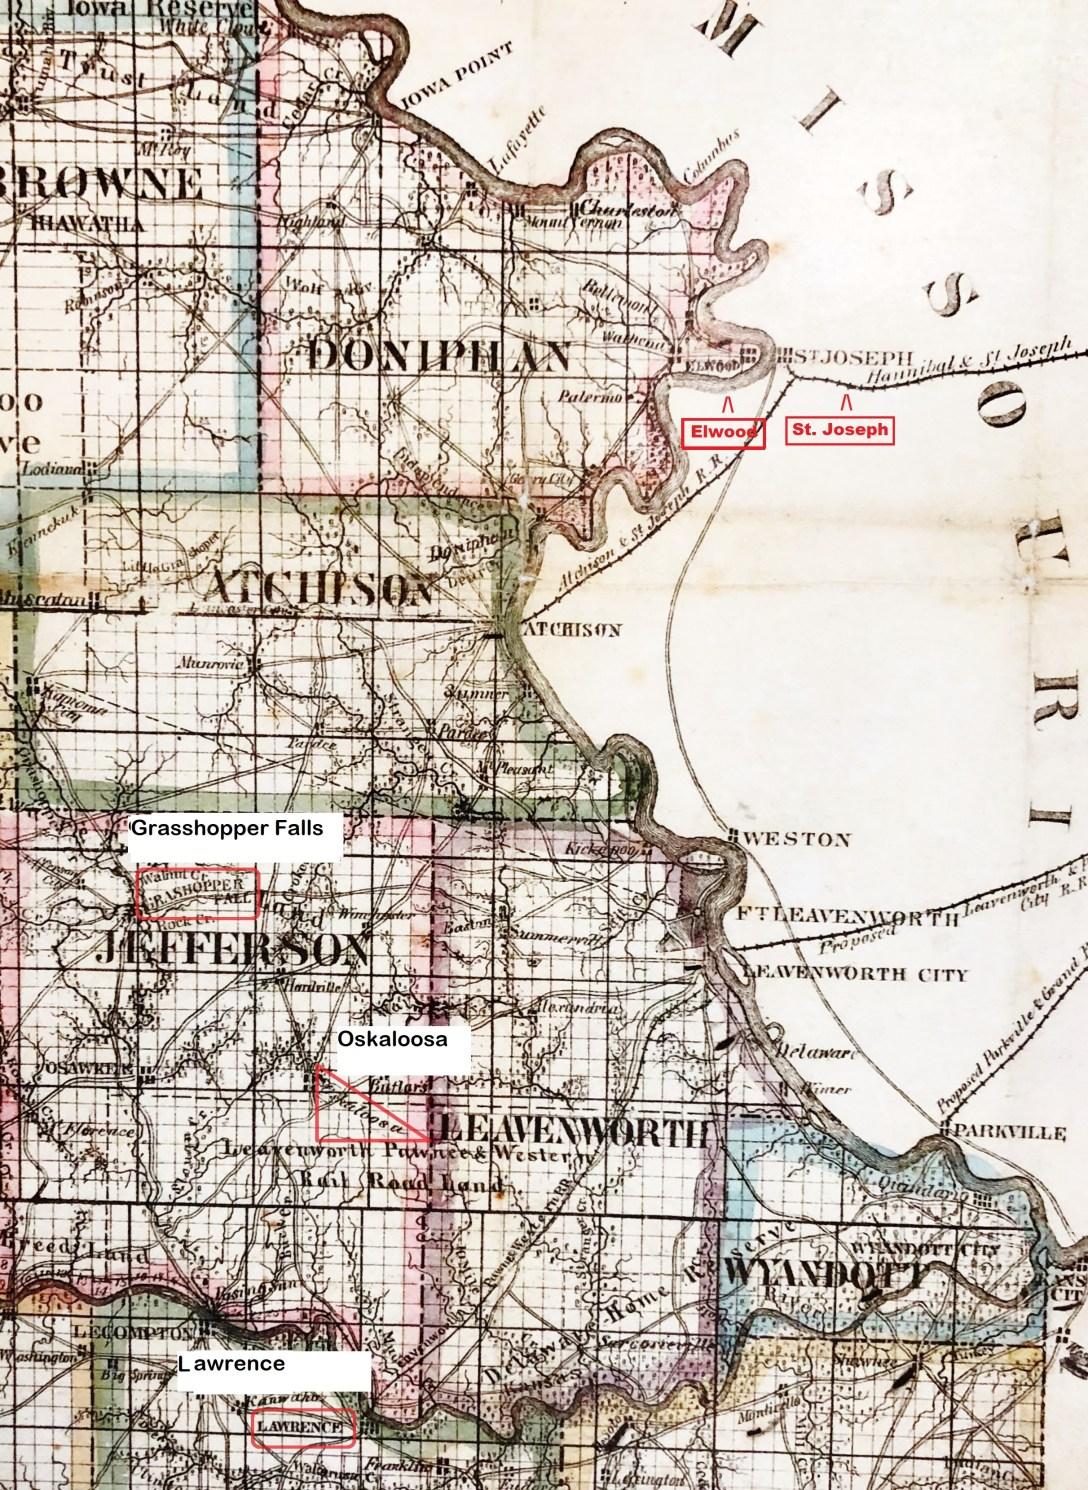 Missouri-Kansas Border War – Jefferson County Jayhawkers and ... on road map of kansas, antique map of kansas, large map of kansas, physical map of kansas, radon map of kansas, blank map of kansas,